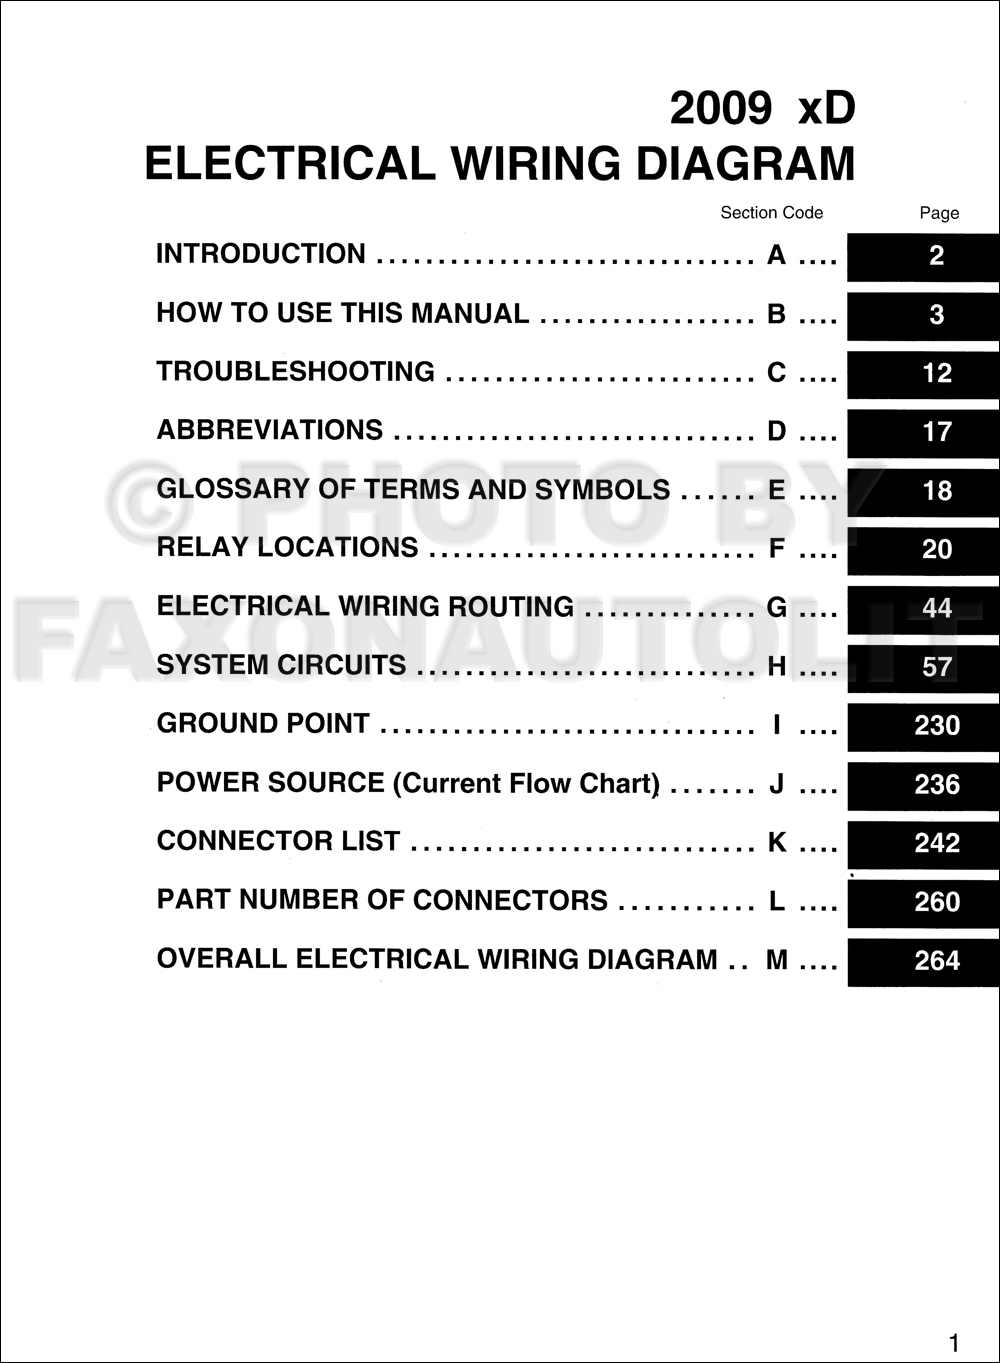 2010 scion tc radio wiring diagram electronic schematics collections2005 scion xb radio wiring diagram scion tc stereo wiring diagramscion xb radio wiring diagram image